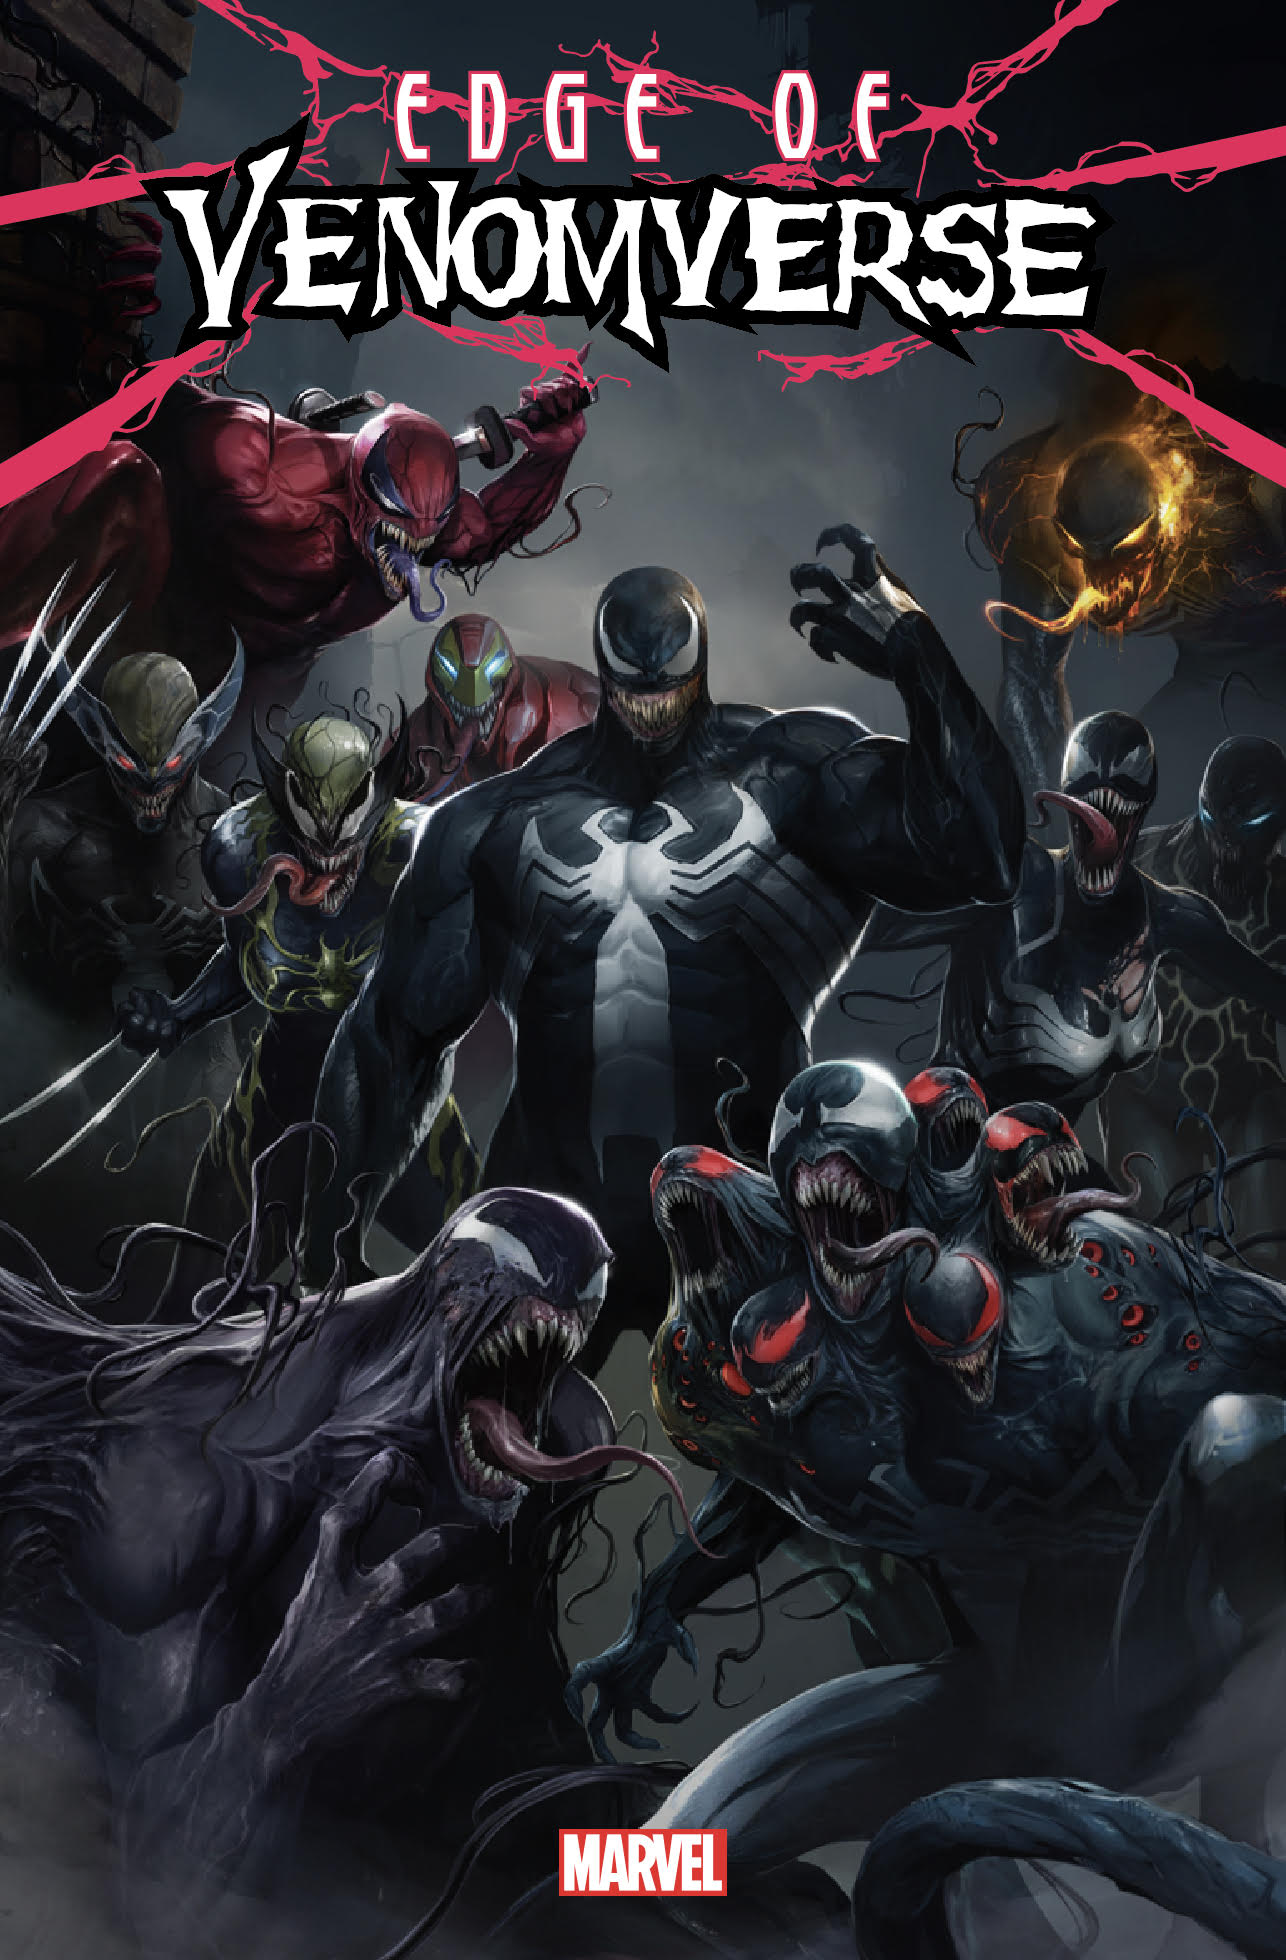 Sony announces 'Venom' film for October 2018 – The Reel Bits